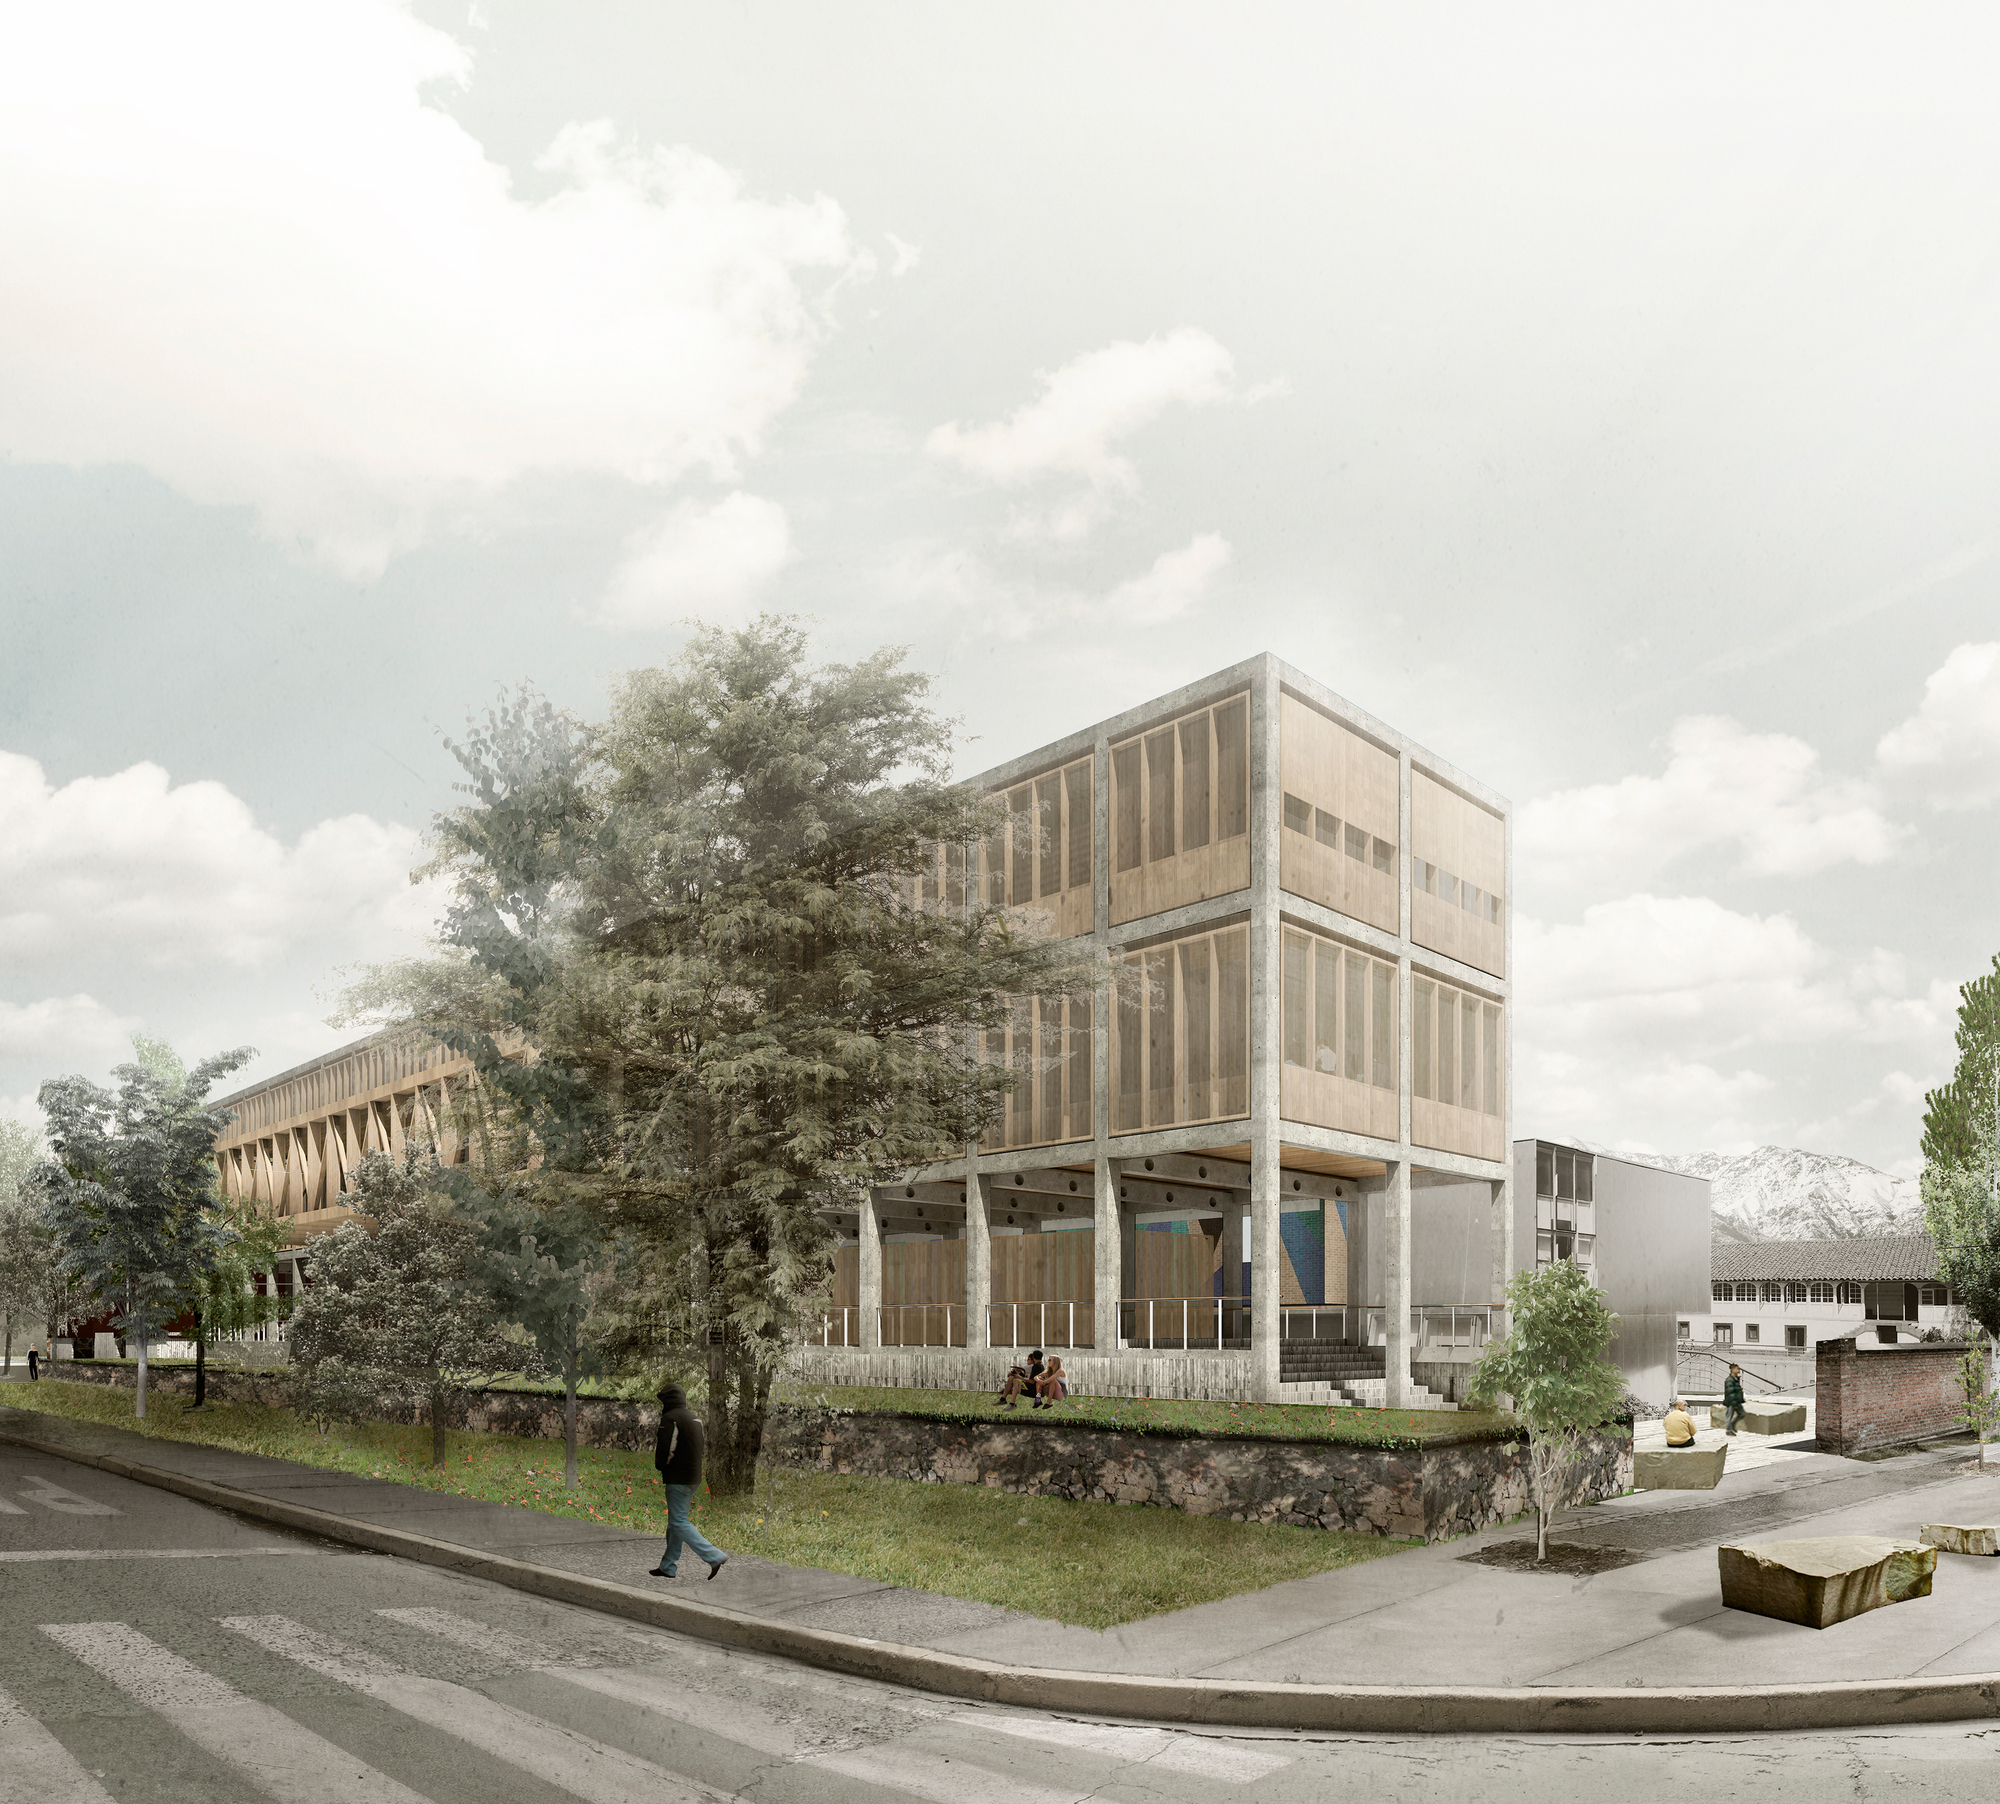 Guillermo hevia garc a nicol s urz a soler tercer lugar for Universidades para arquitectura